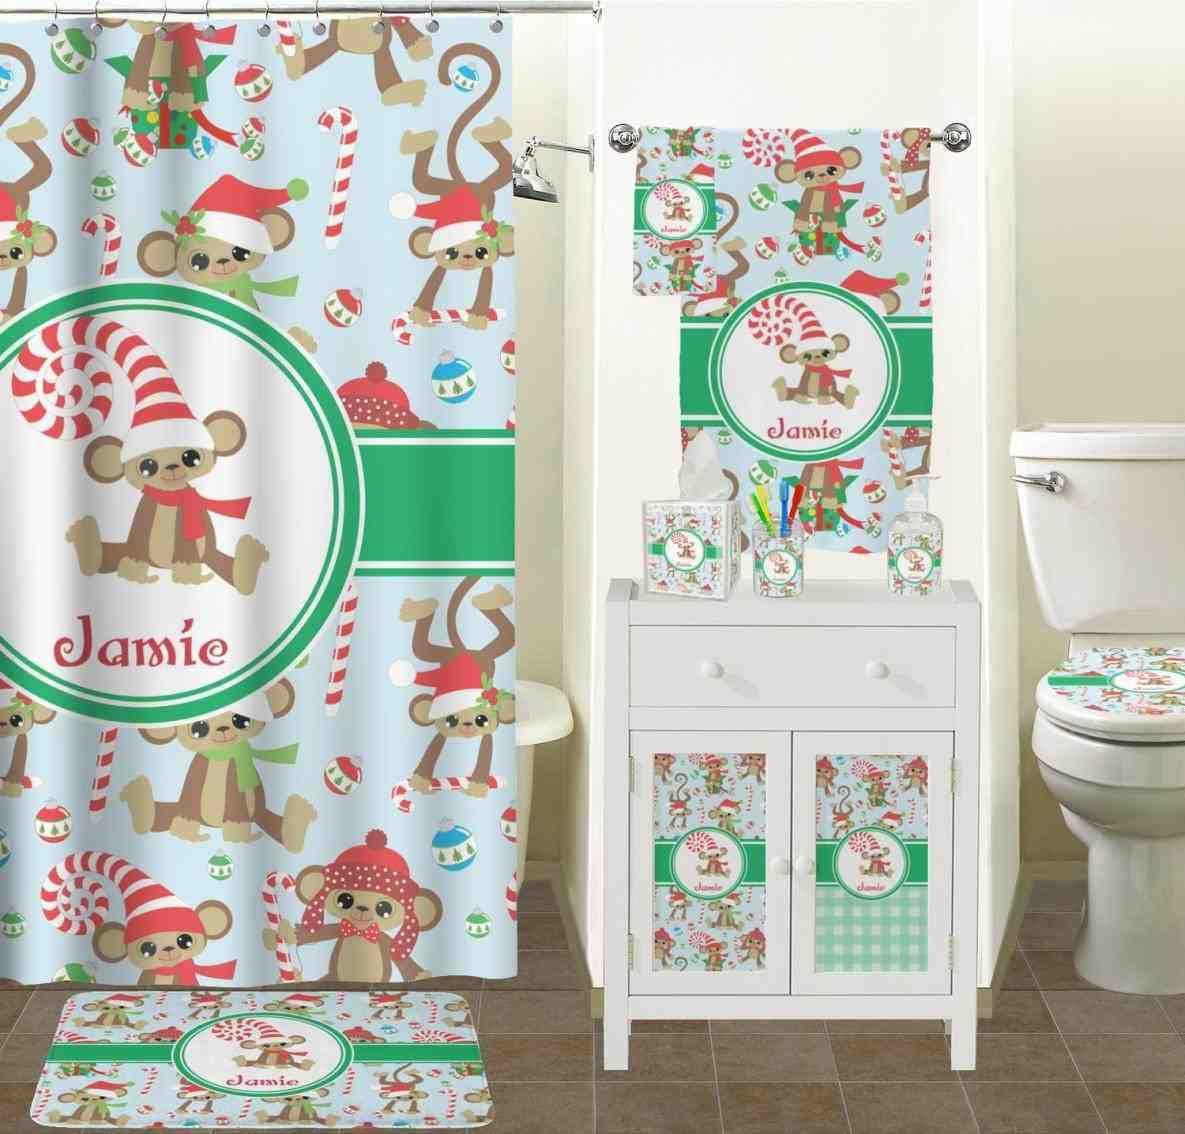 New Post monkey bathroom accessories | LivingRooms | Pinterest ...